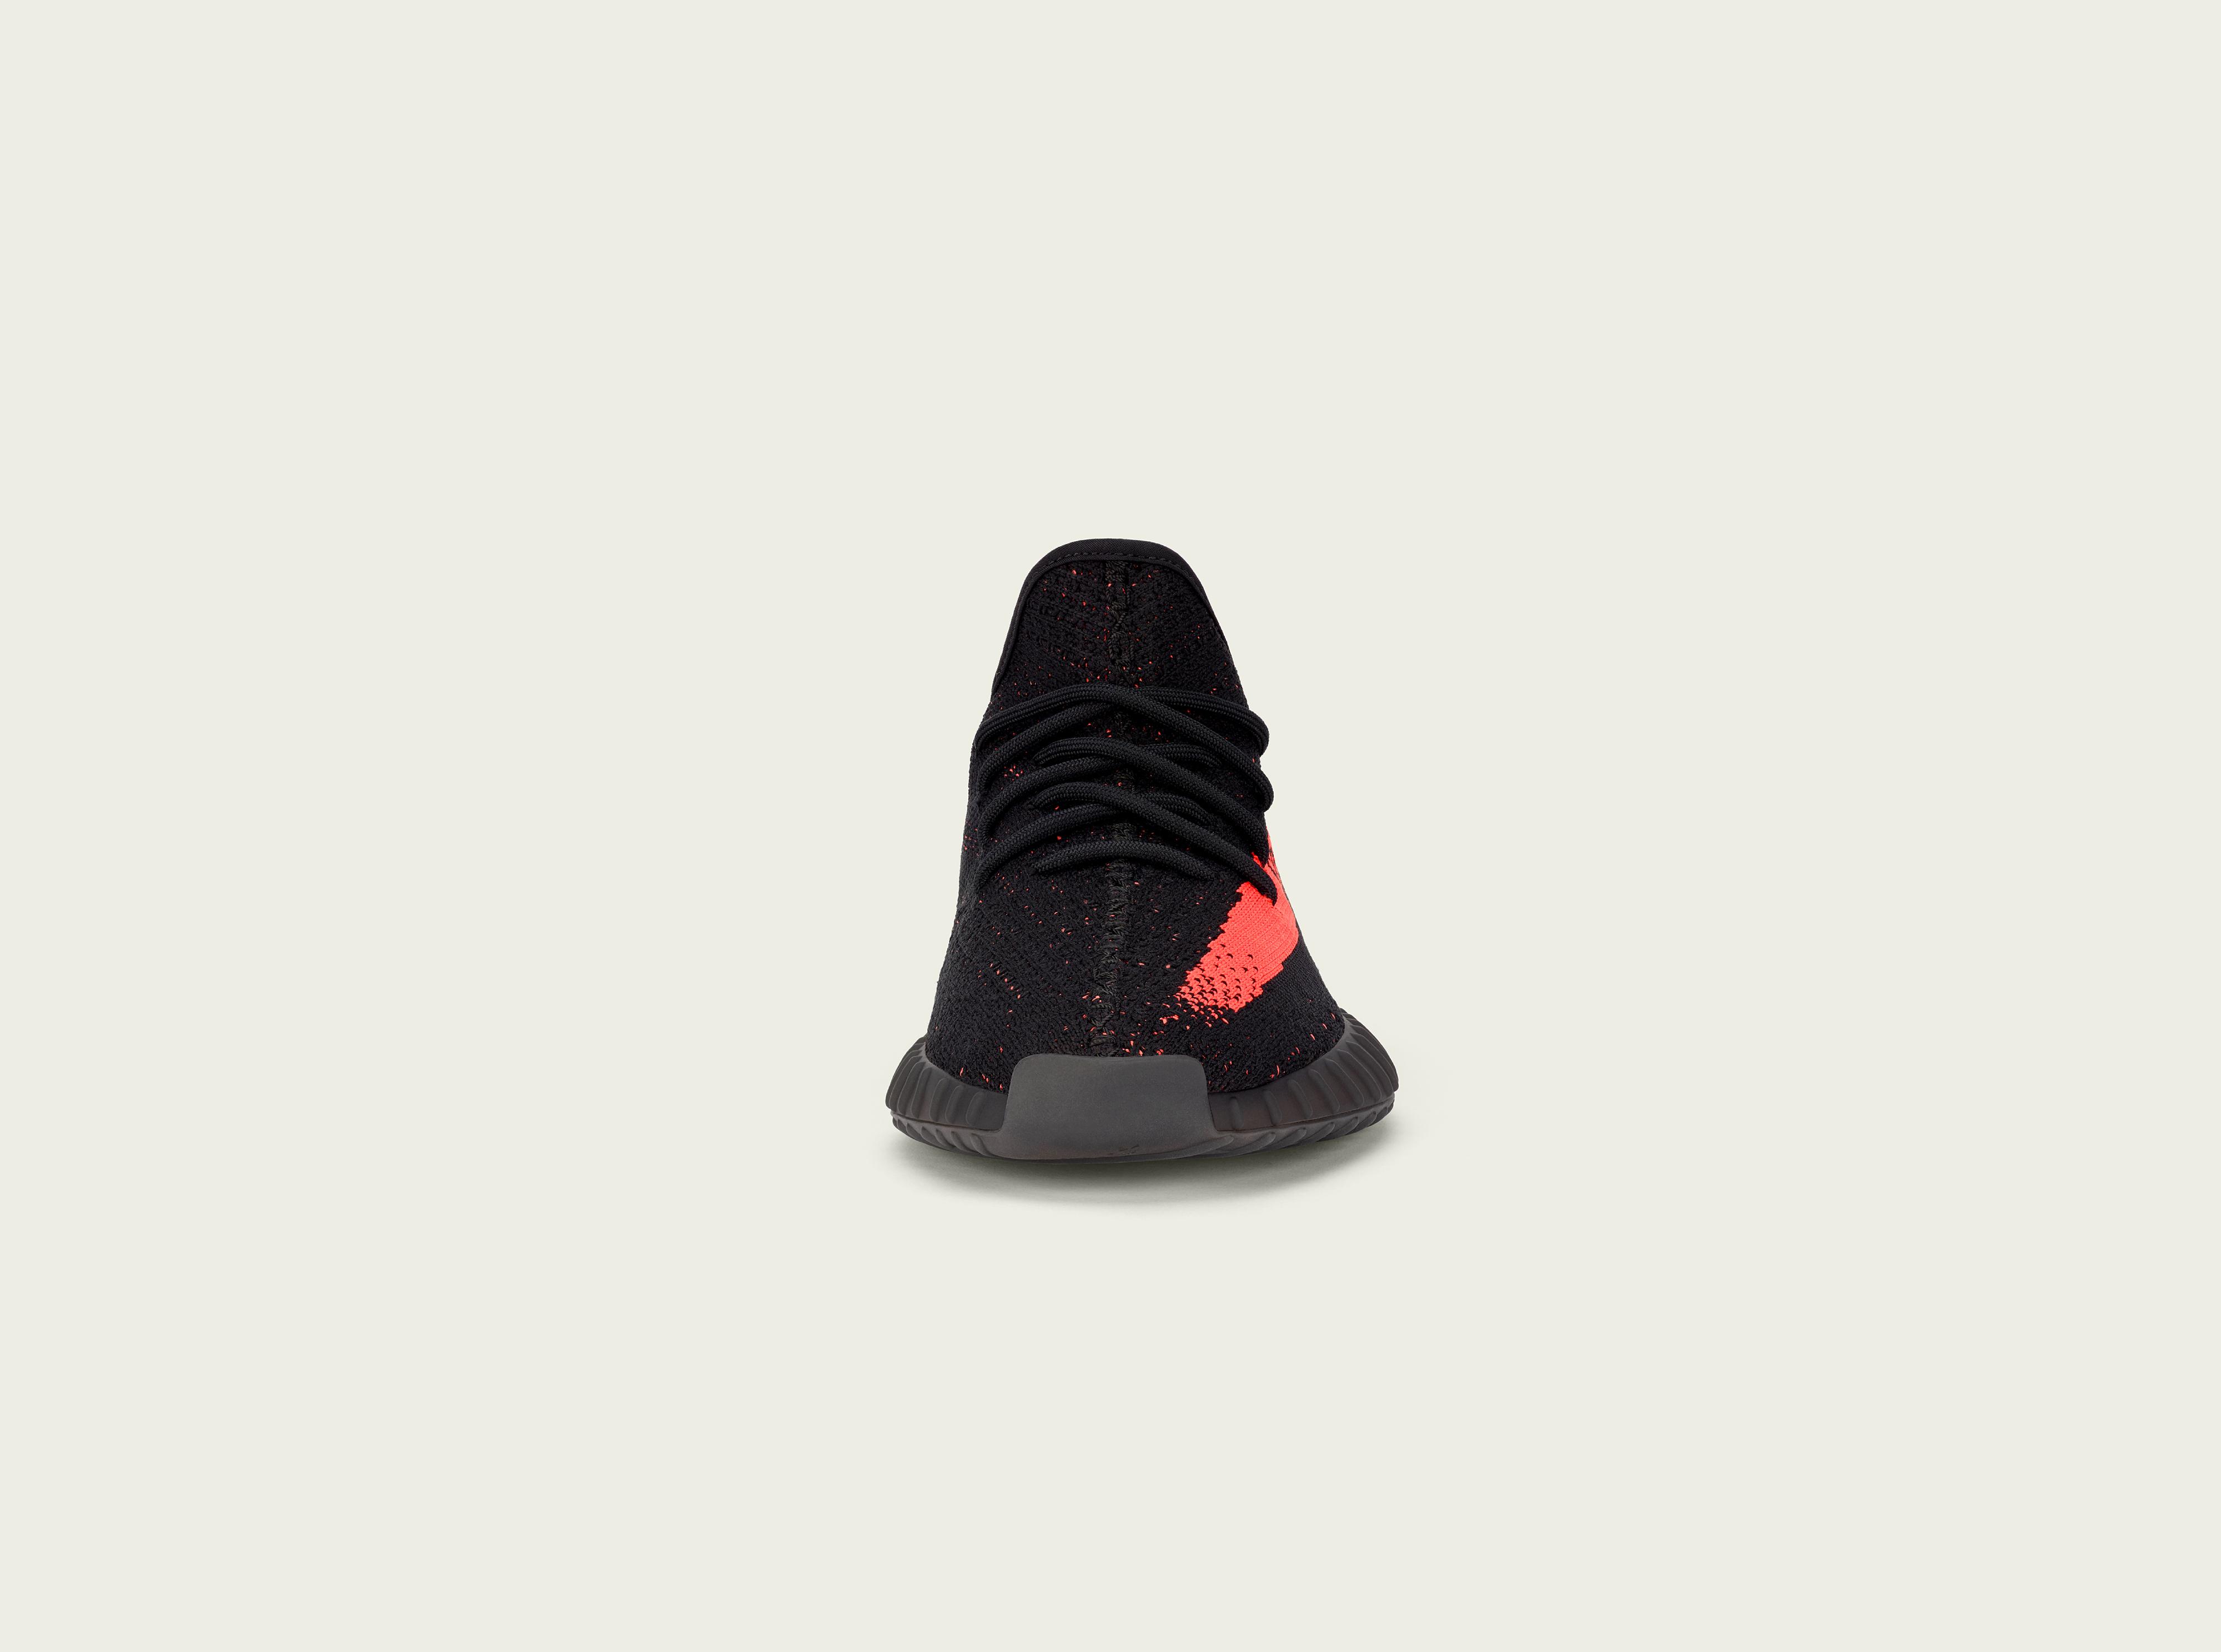 adidas_originals_yeezyboost_350_v2_red_02